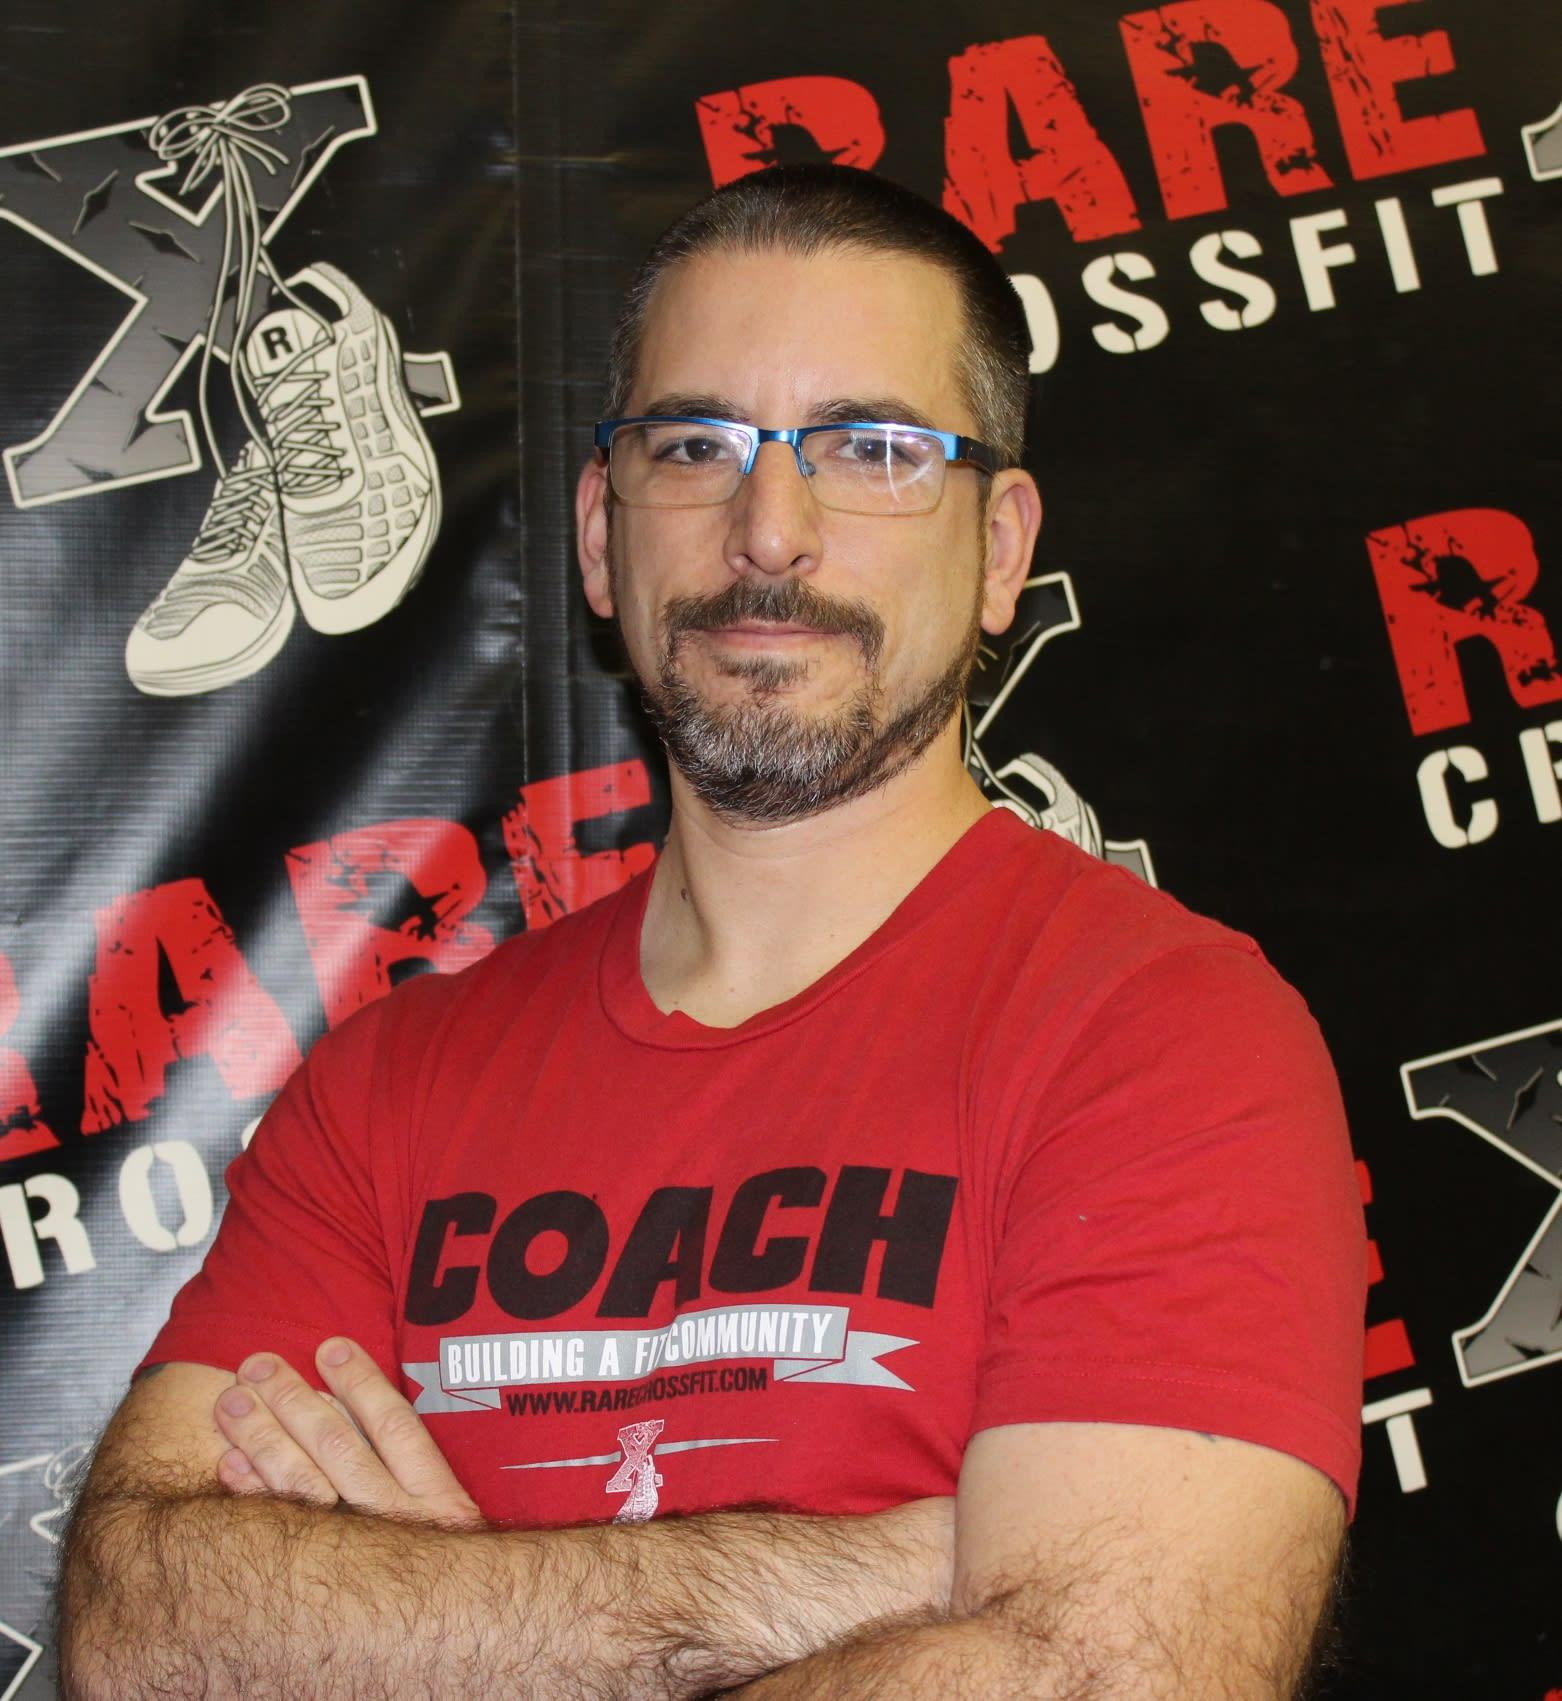 Ryan Starkey in Fredericksburg - RARE CrossFit